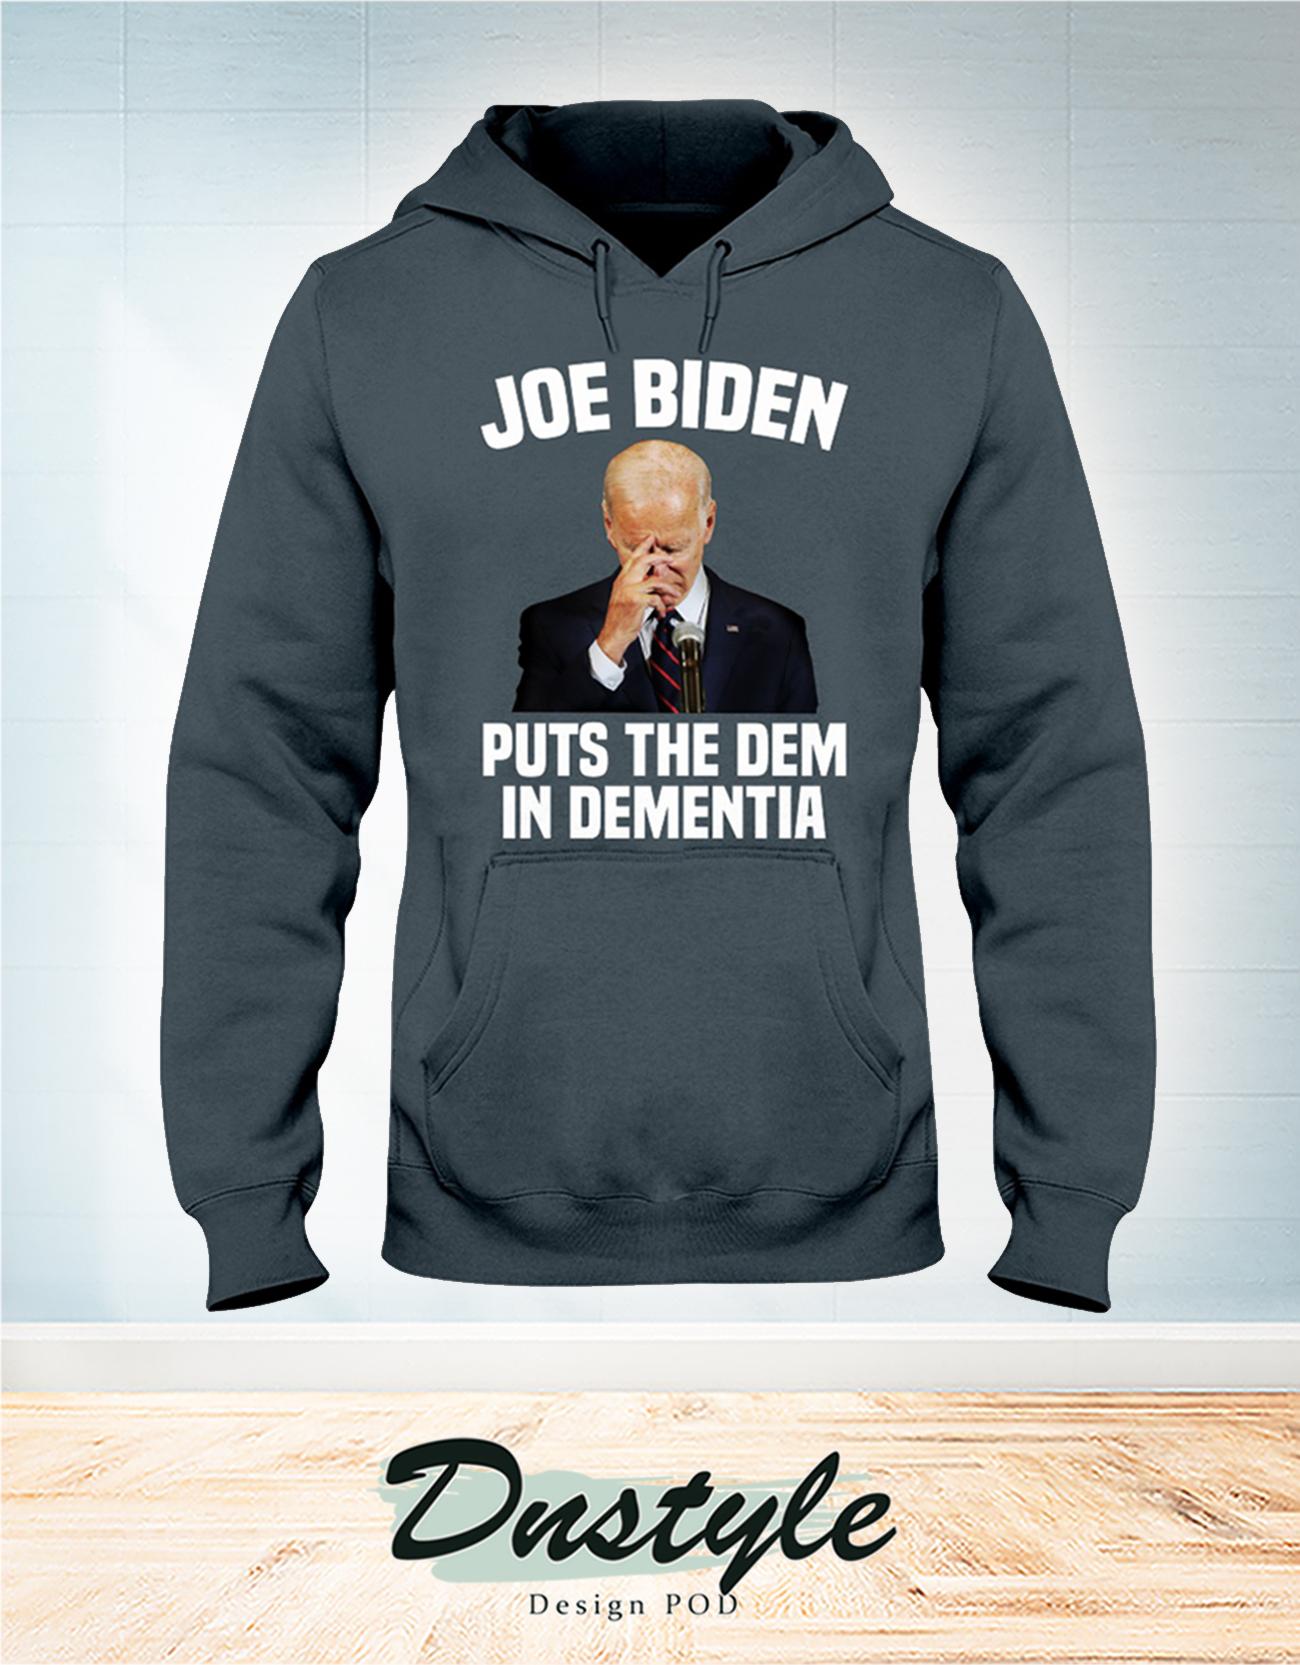 Joe biden puts the dem in dementia hoodie